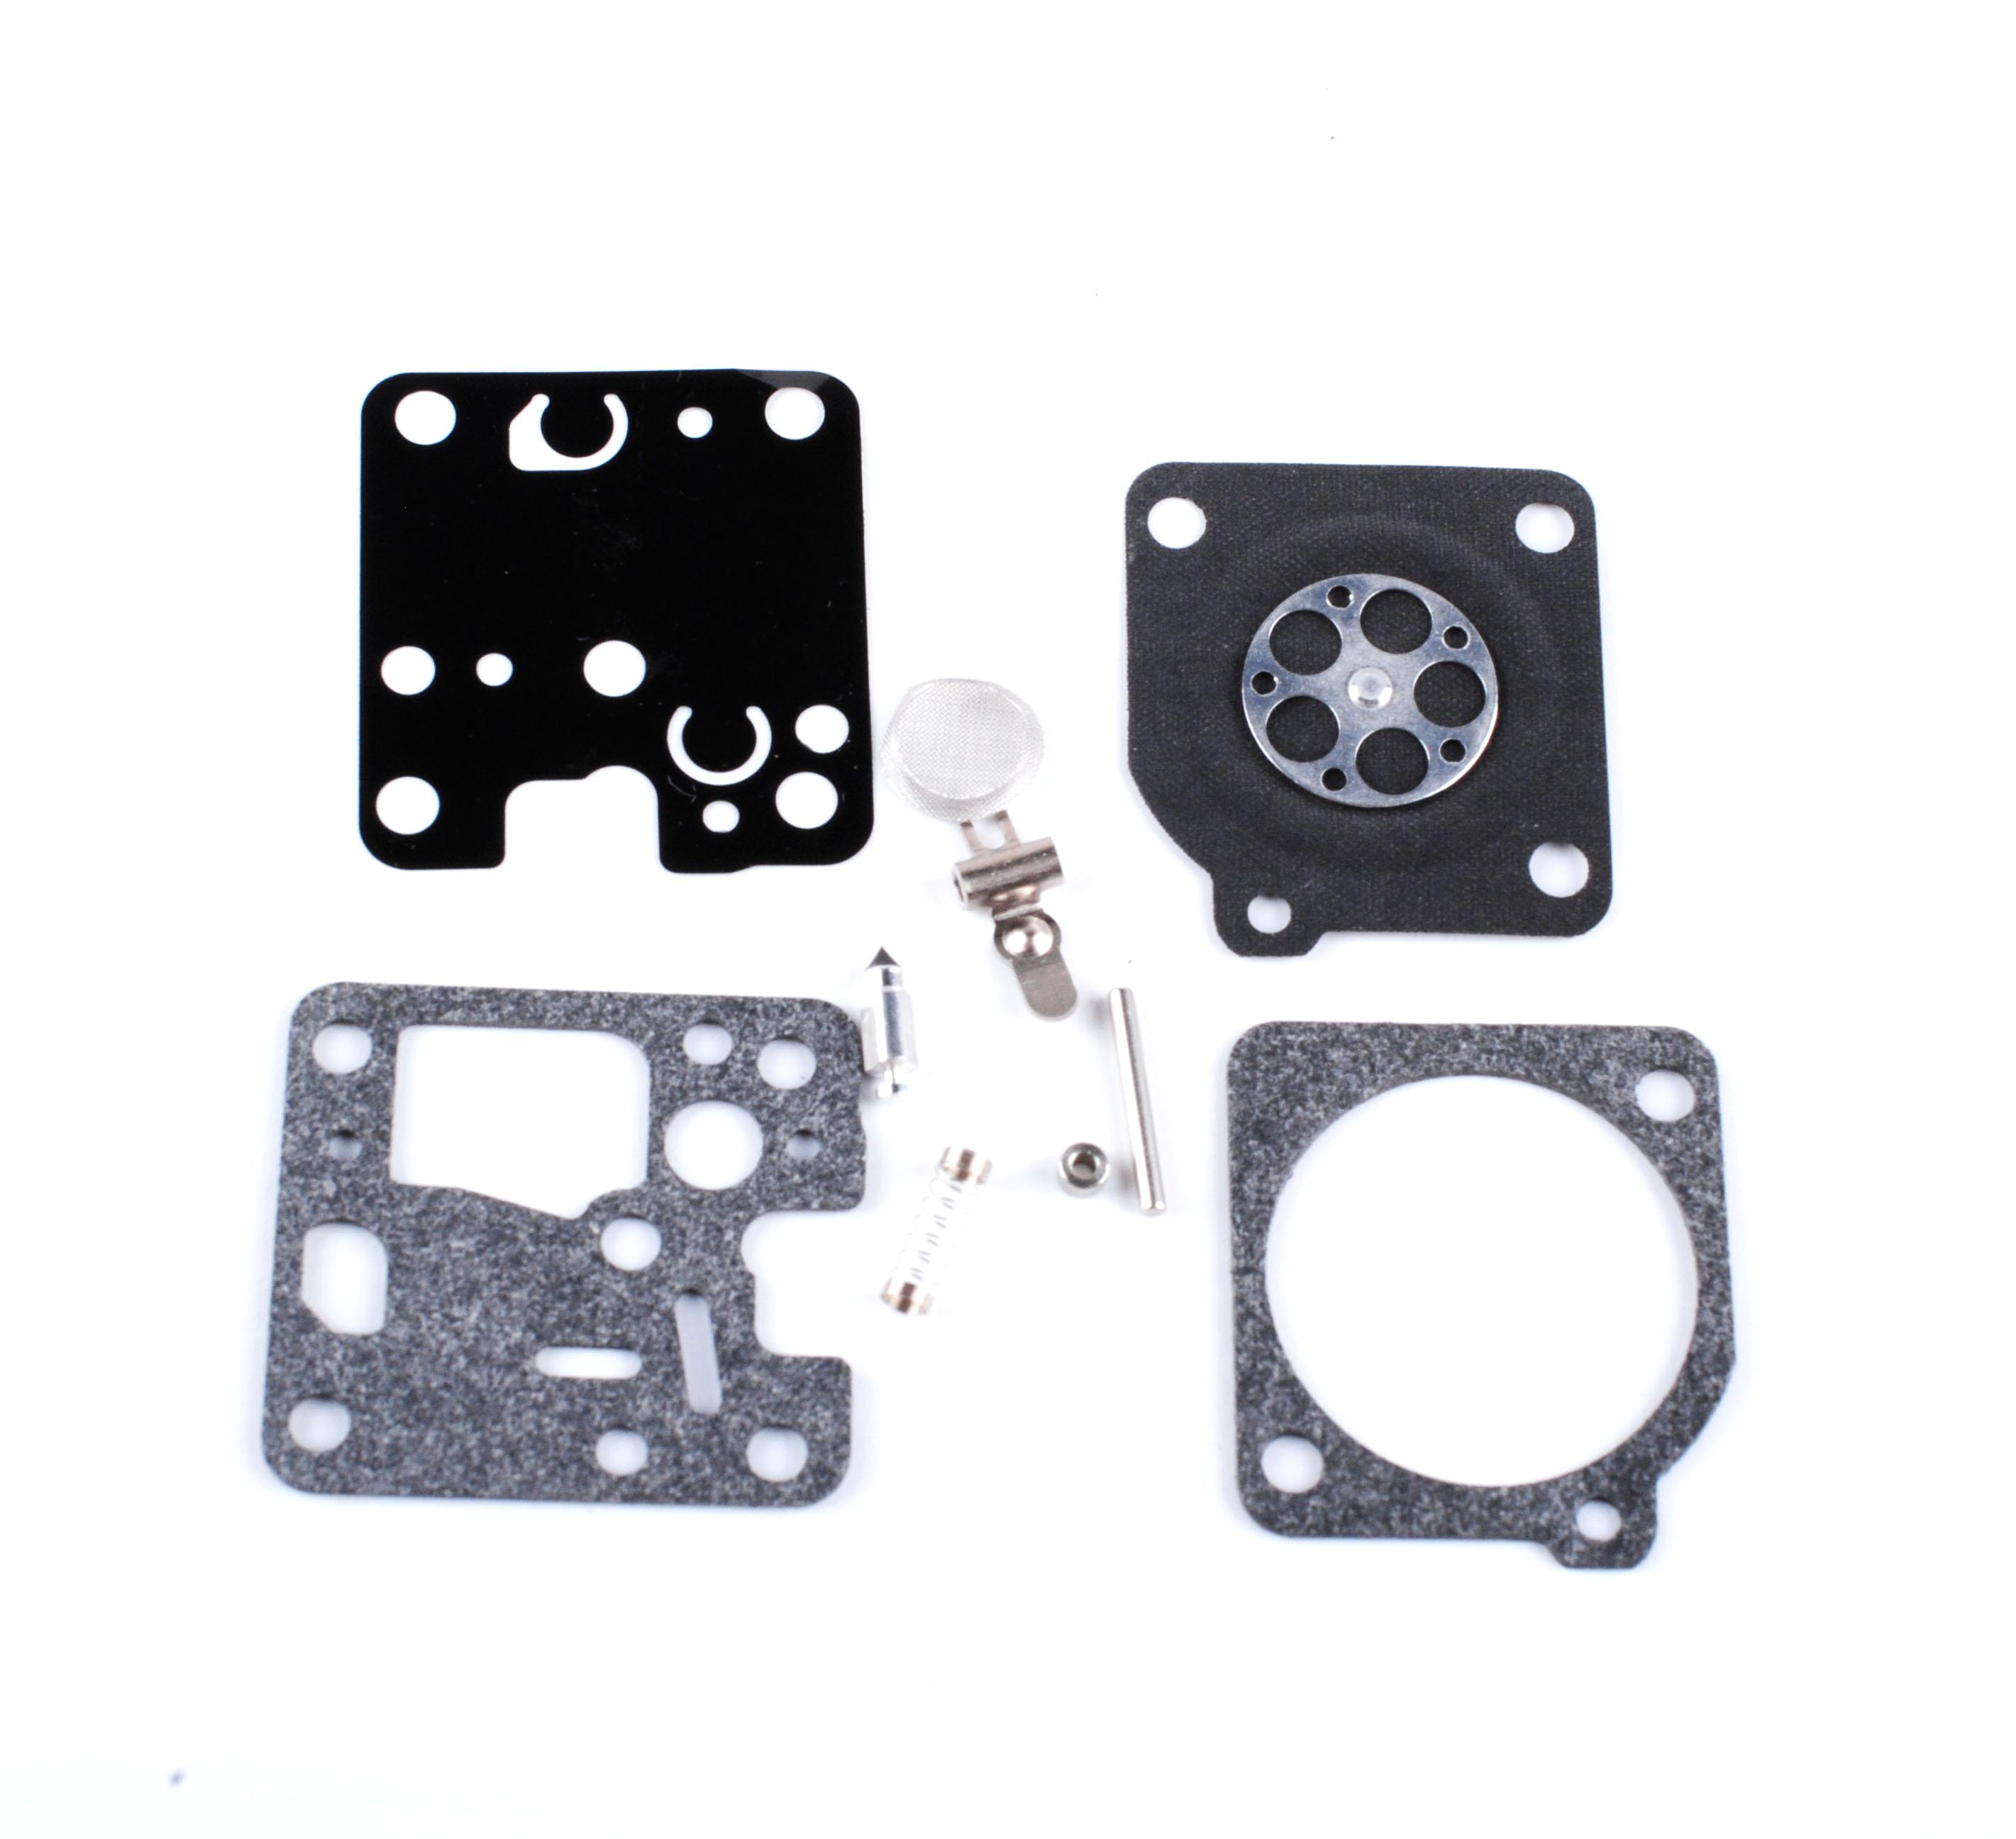 Carburetor Rebuild Kit for Echo SRM230 SRM231 210 210i 225 Parts ZAMA RB-107